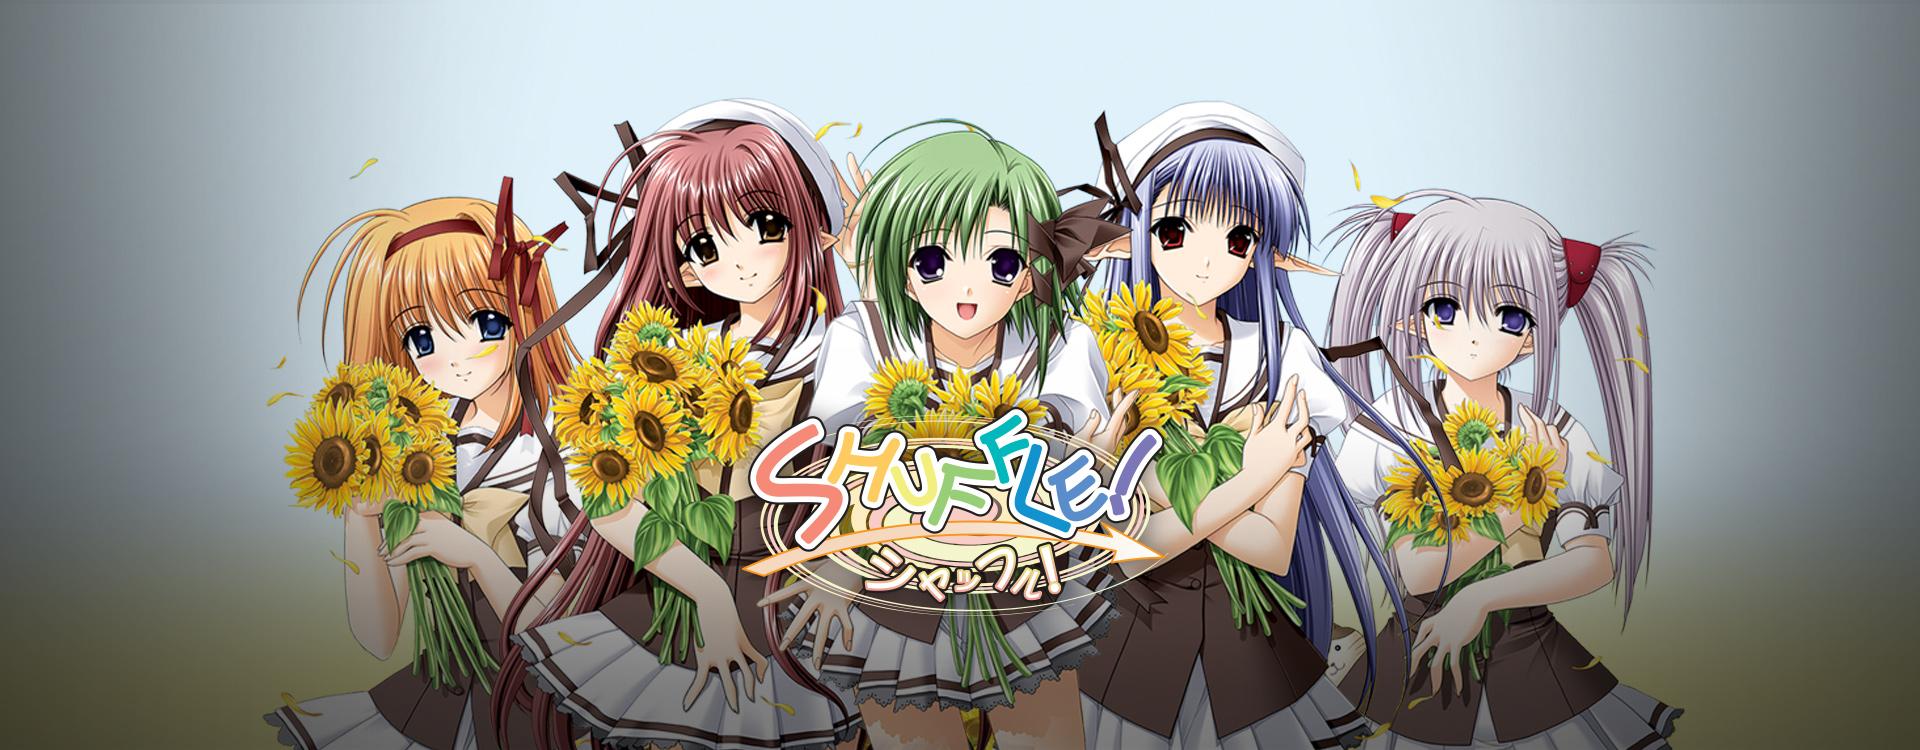 Watch Shuffle! Season 1 Episode 6 Anime Uncut on Funimation